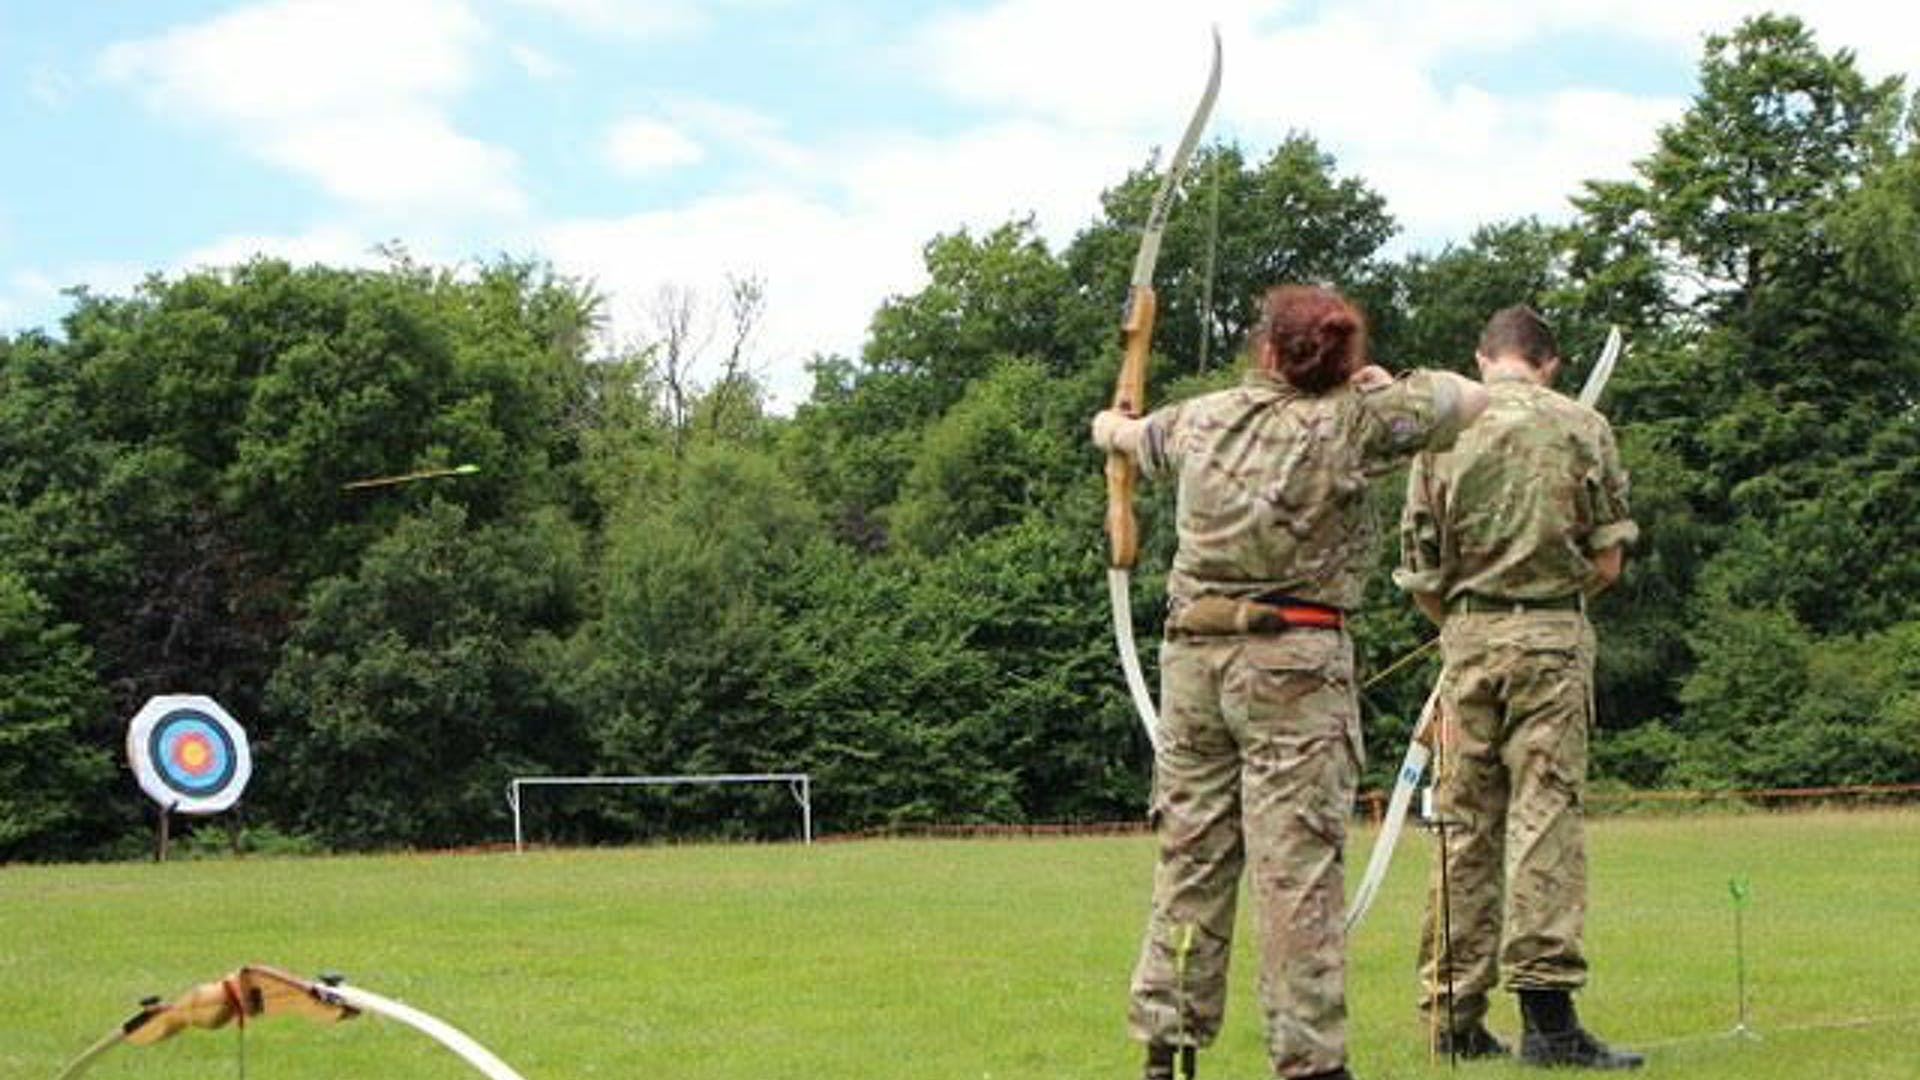 Priory Academy LSST L Cpl Owen Frances 2 taken at Crowborough Training Camp an action shot of CFAV 2 Lt Gemma Anthony 1